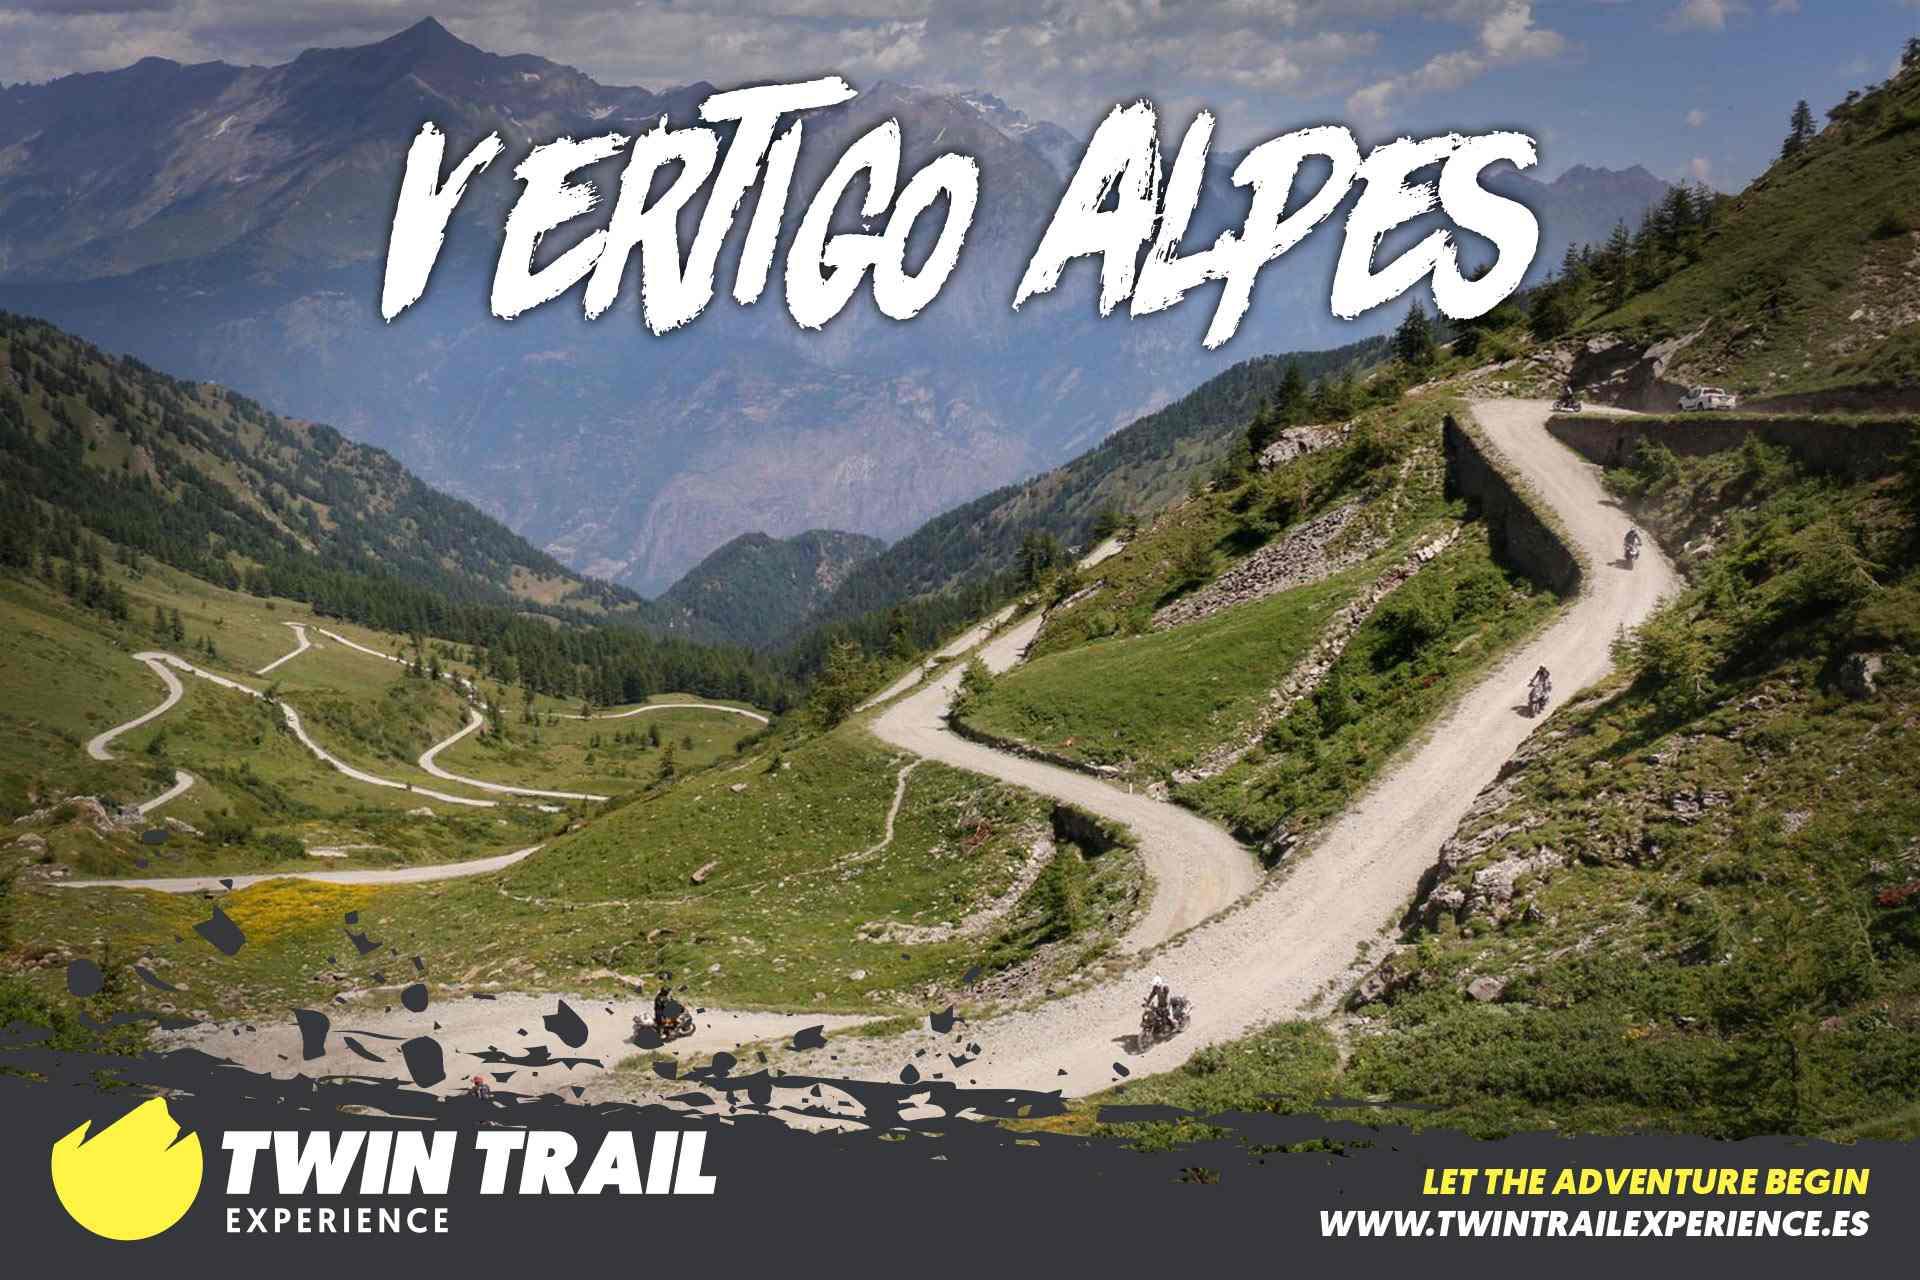 TwinTrail: Vertigo Alpes